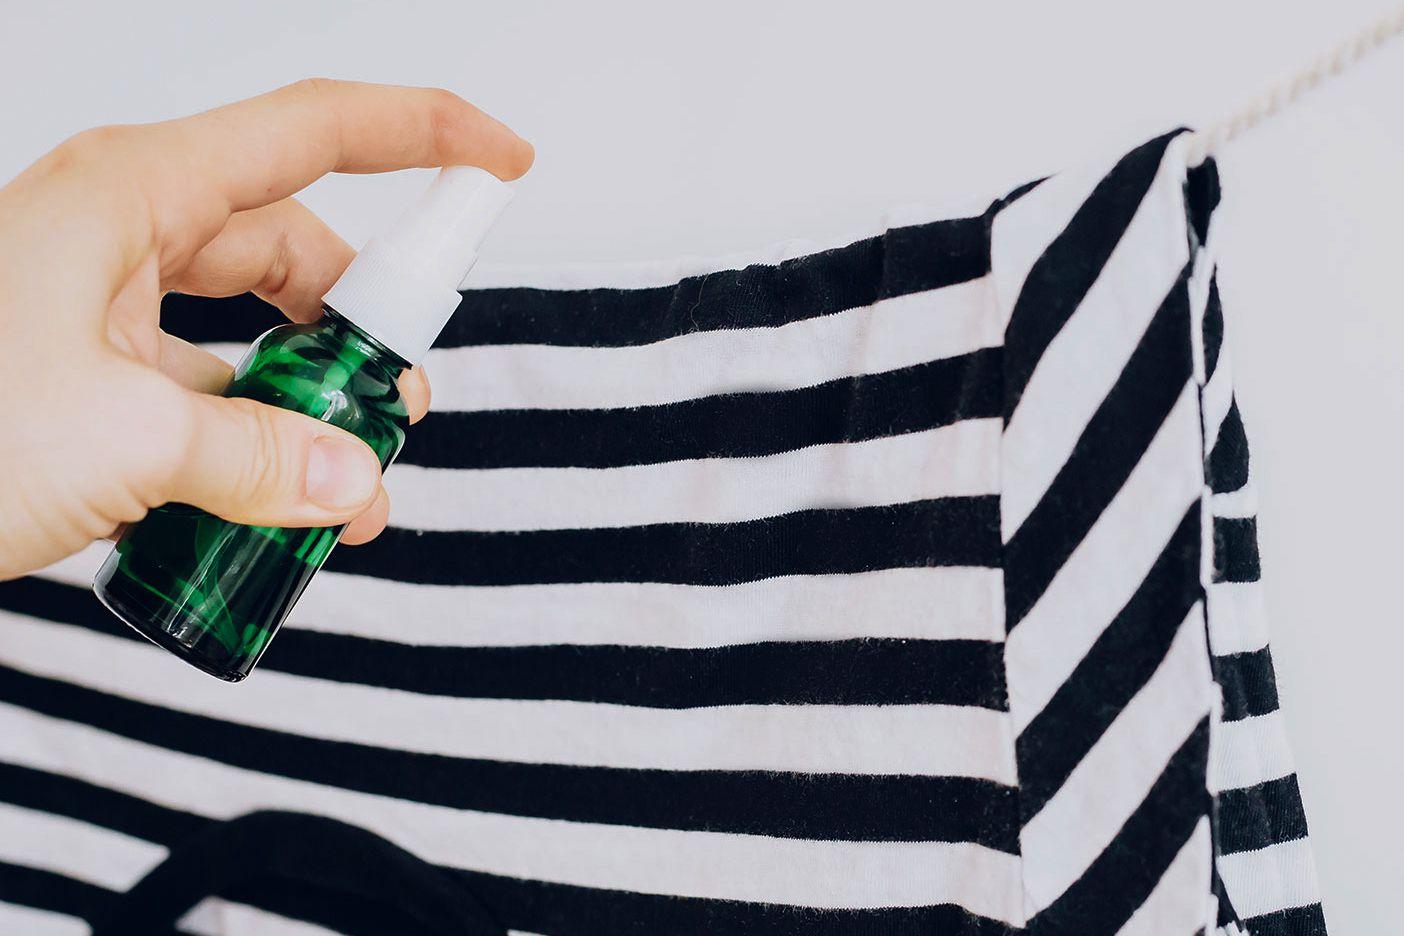 spraying a garment with deodorizer